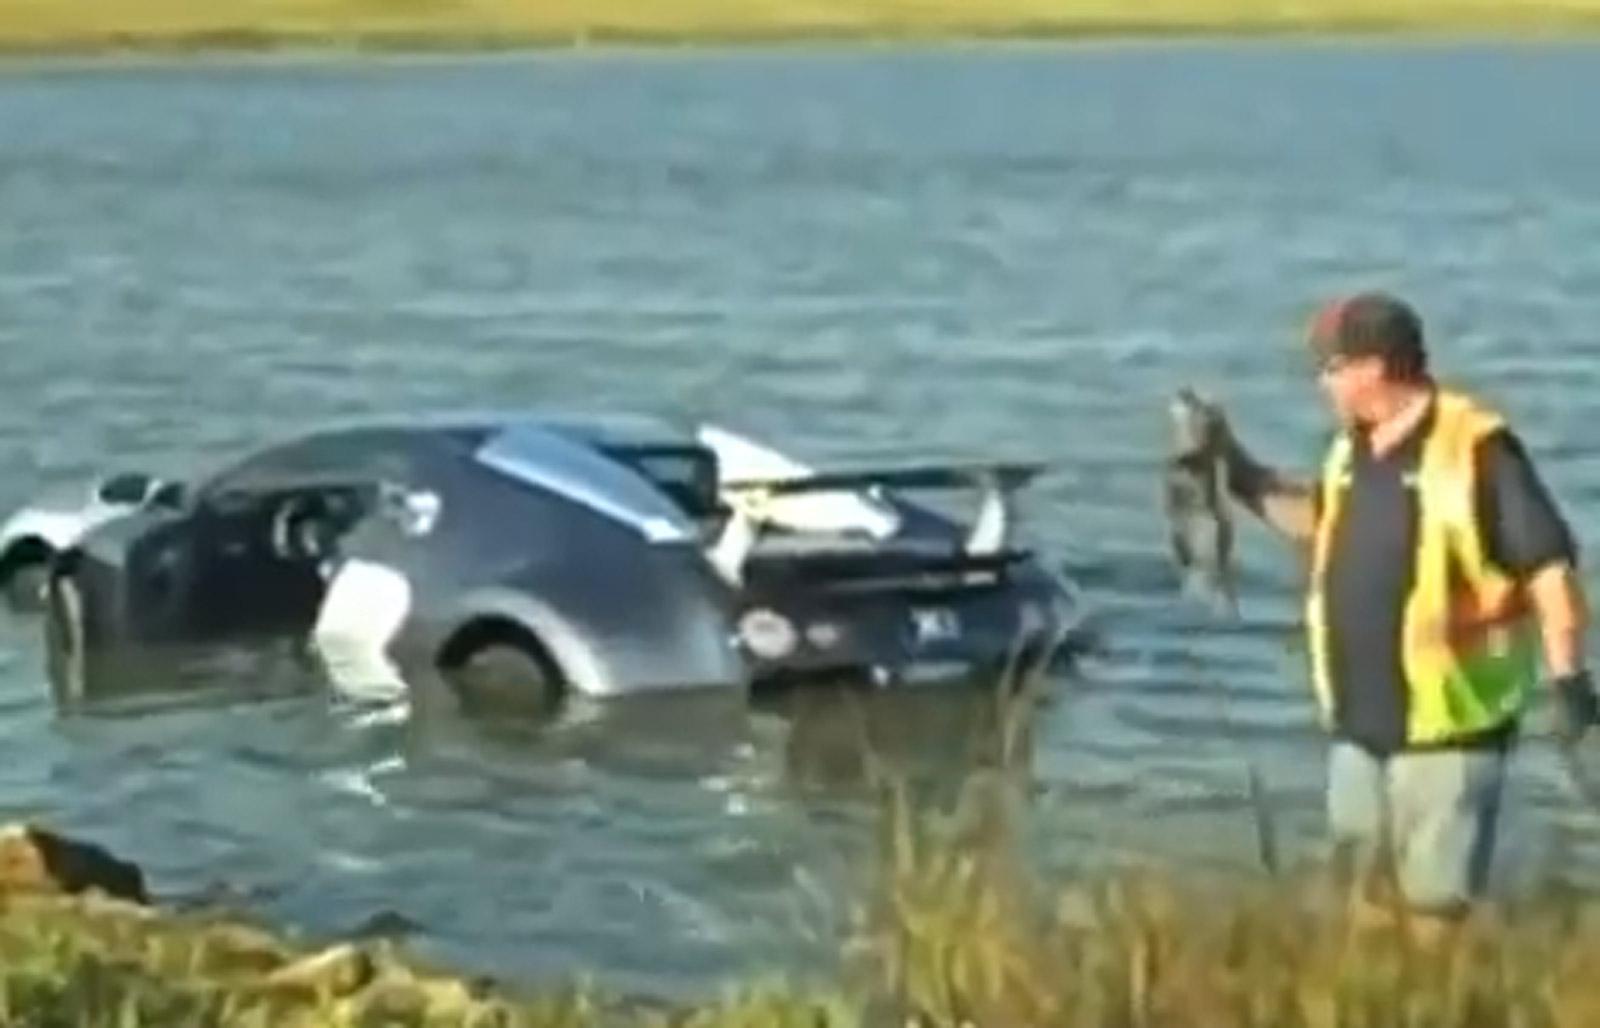 bugatti-veyron-that-crashed-into-a-lake-in-2009_100477841_h